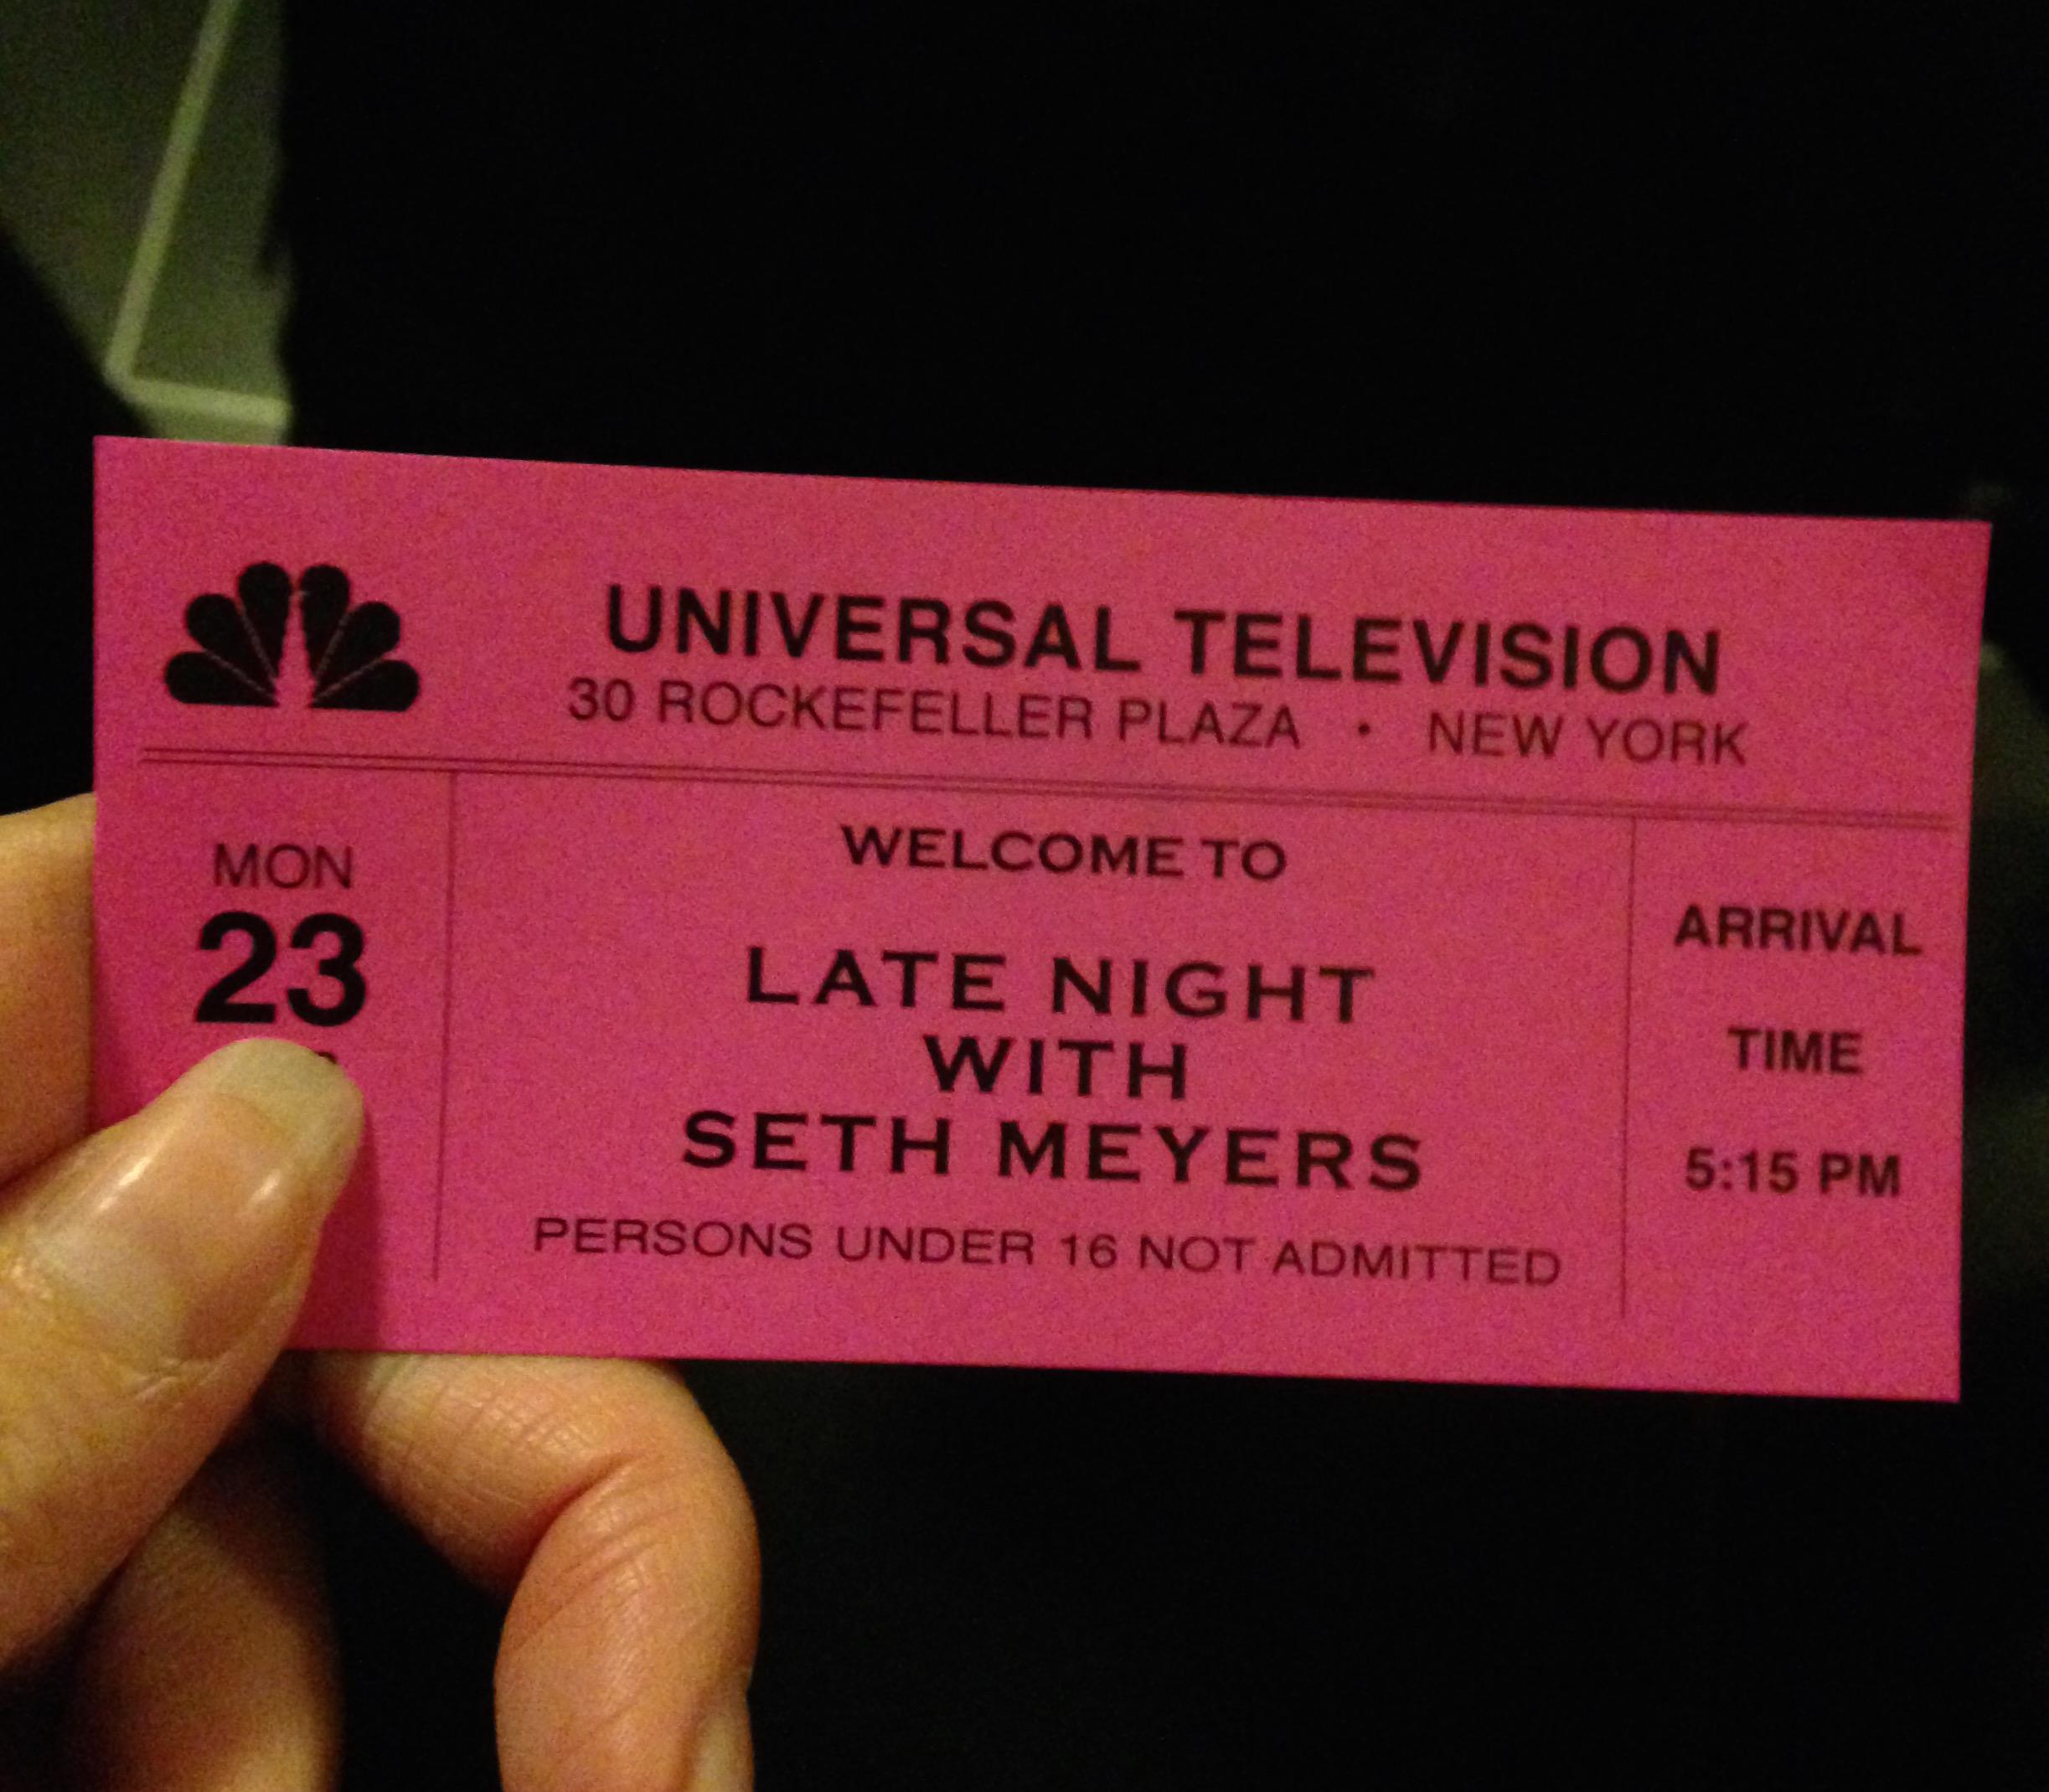 Seth Meyers Studio Tour